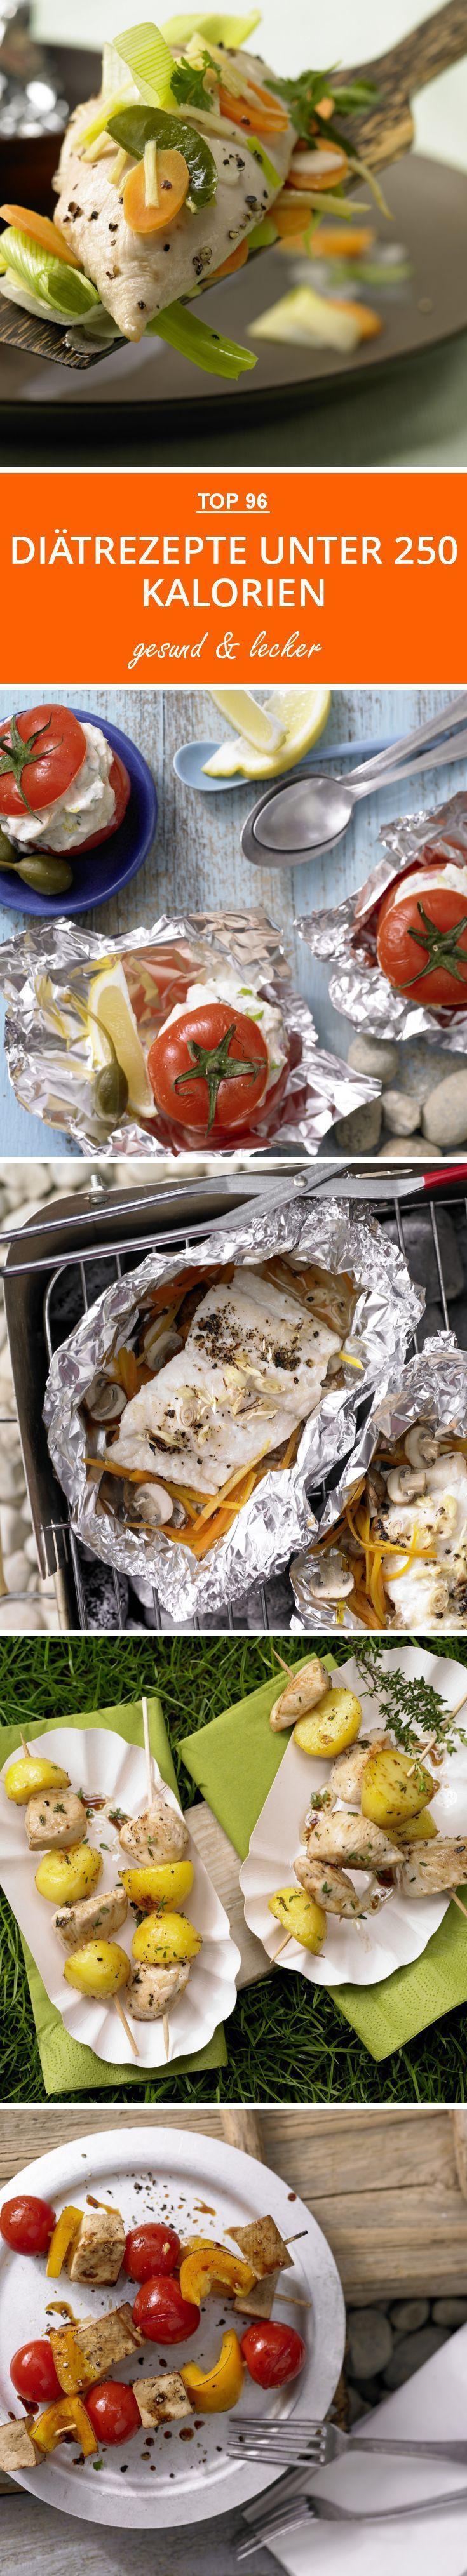 Diat Rezepte Unter 250 Kcal Yemek